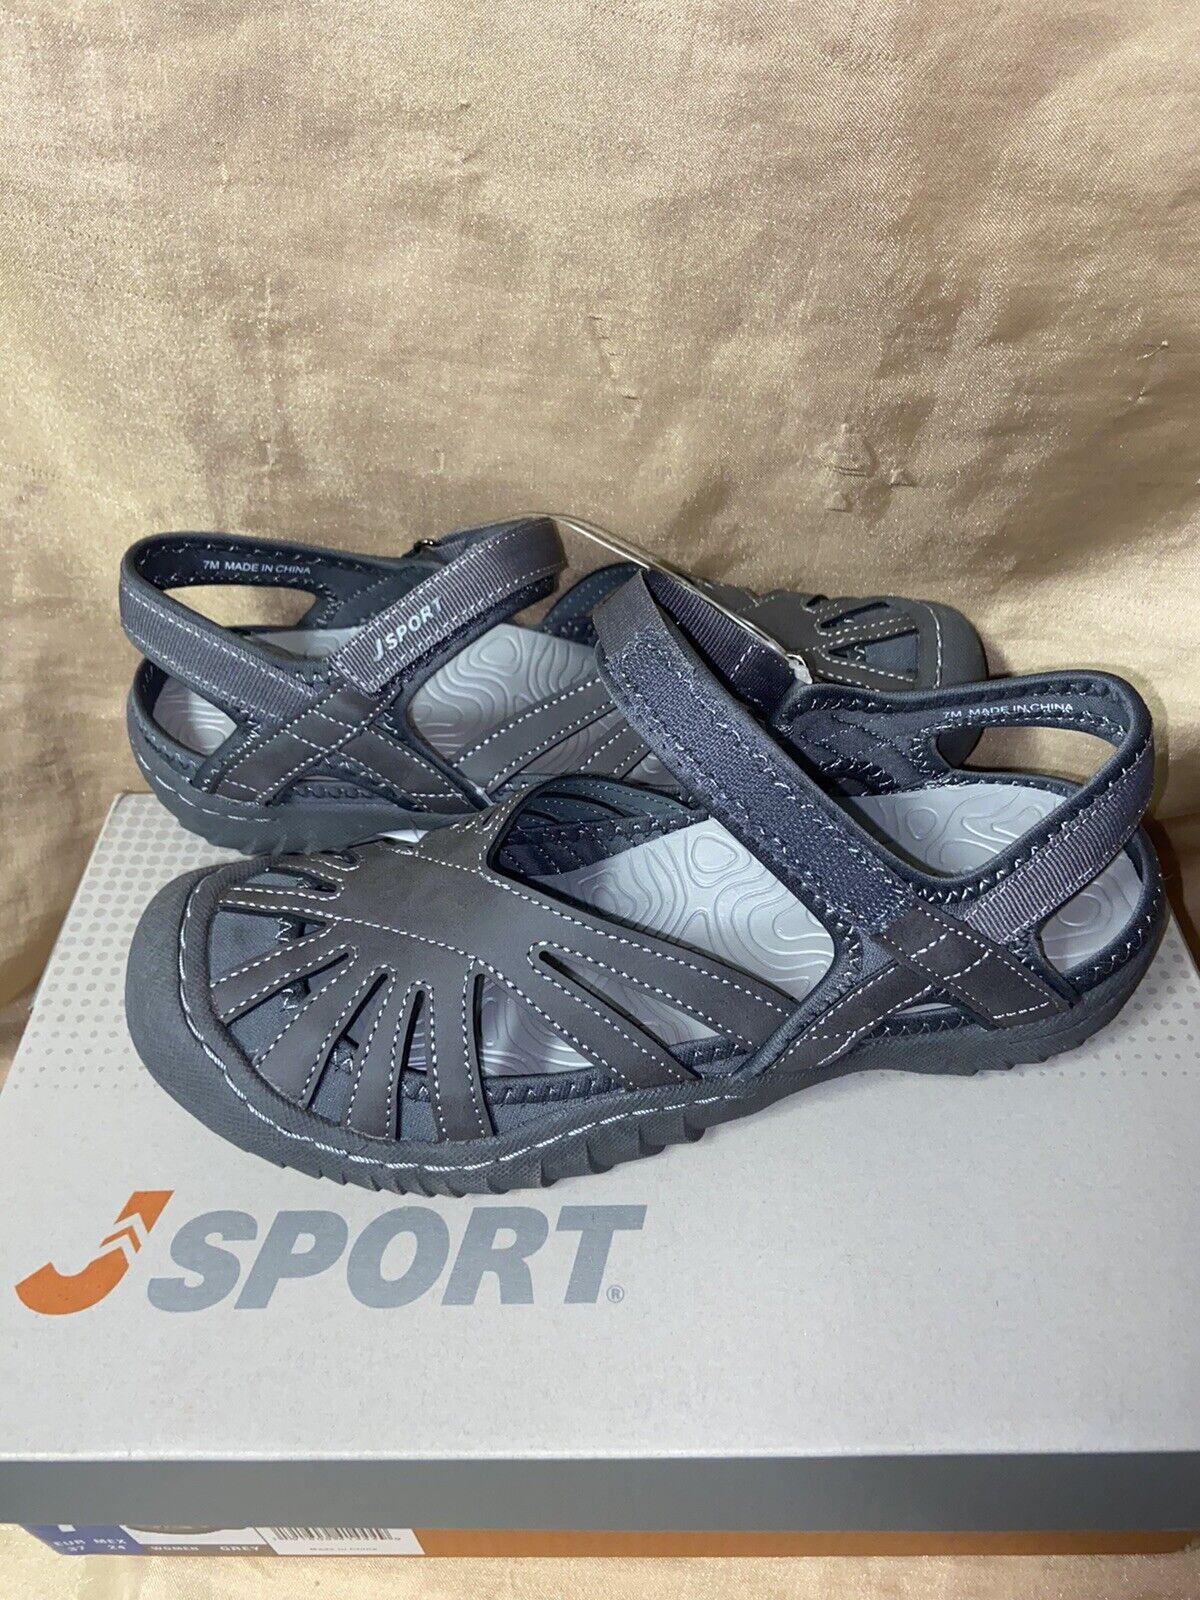 New! Jambu JSport Poppy grey Womens size 8 walking strap san